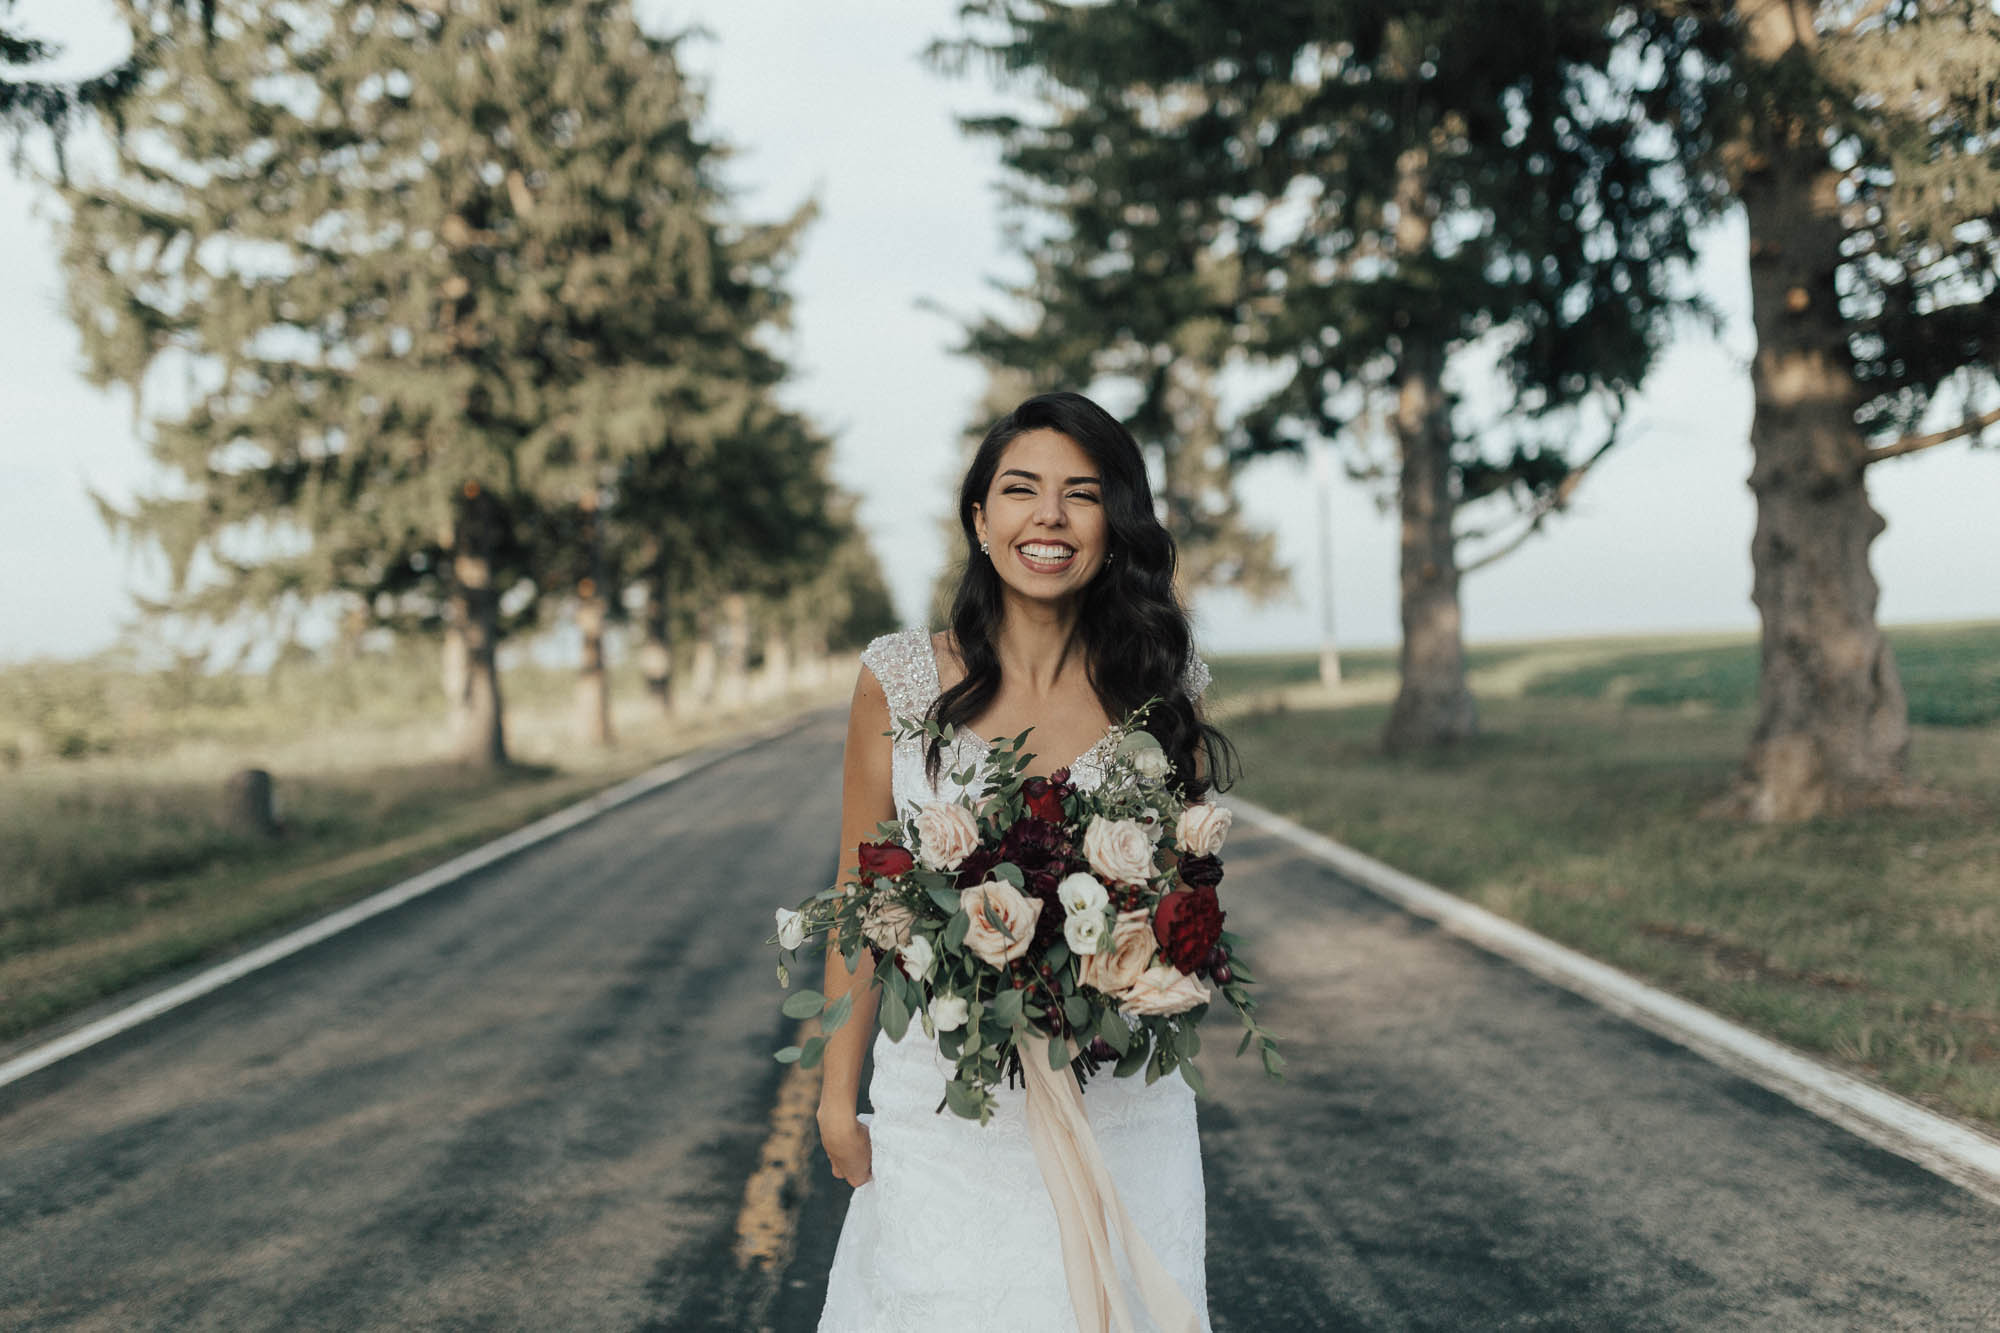 champaign_il_wedding_photography-0739.jpg